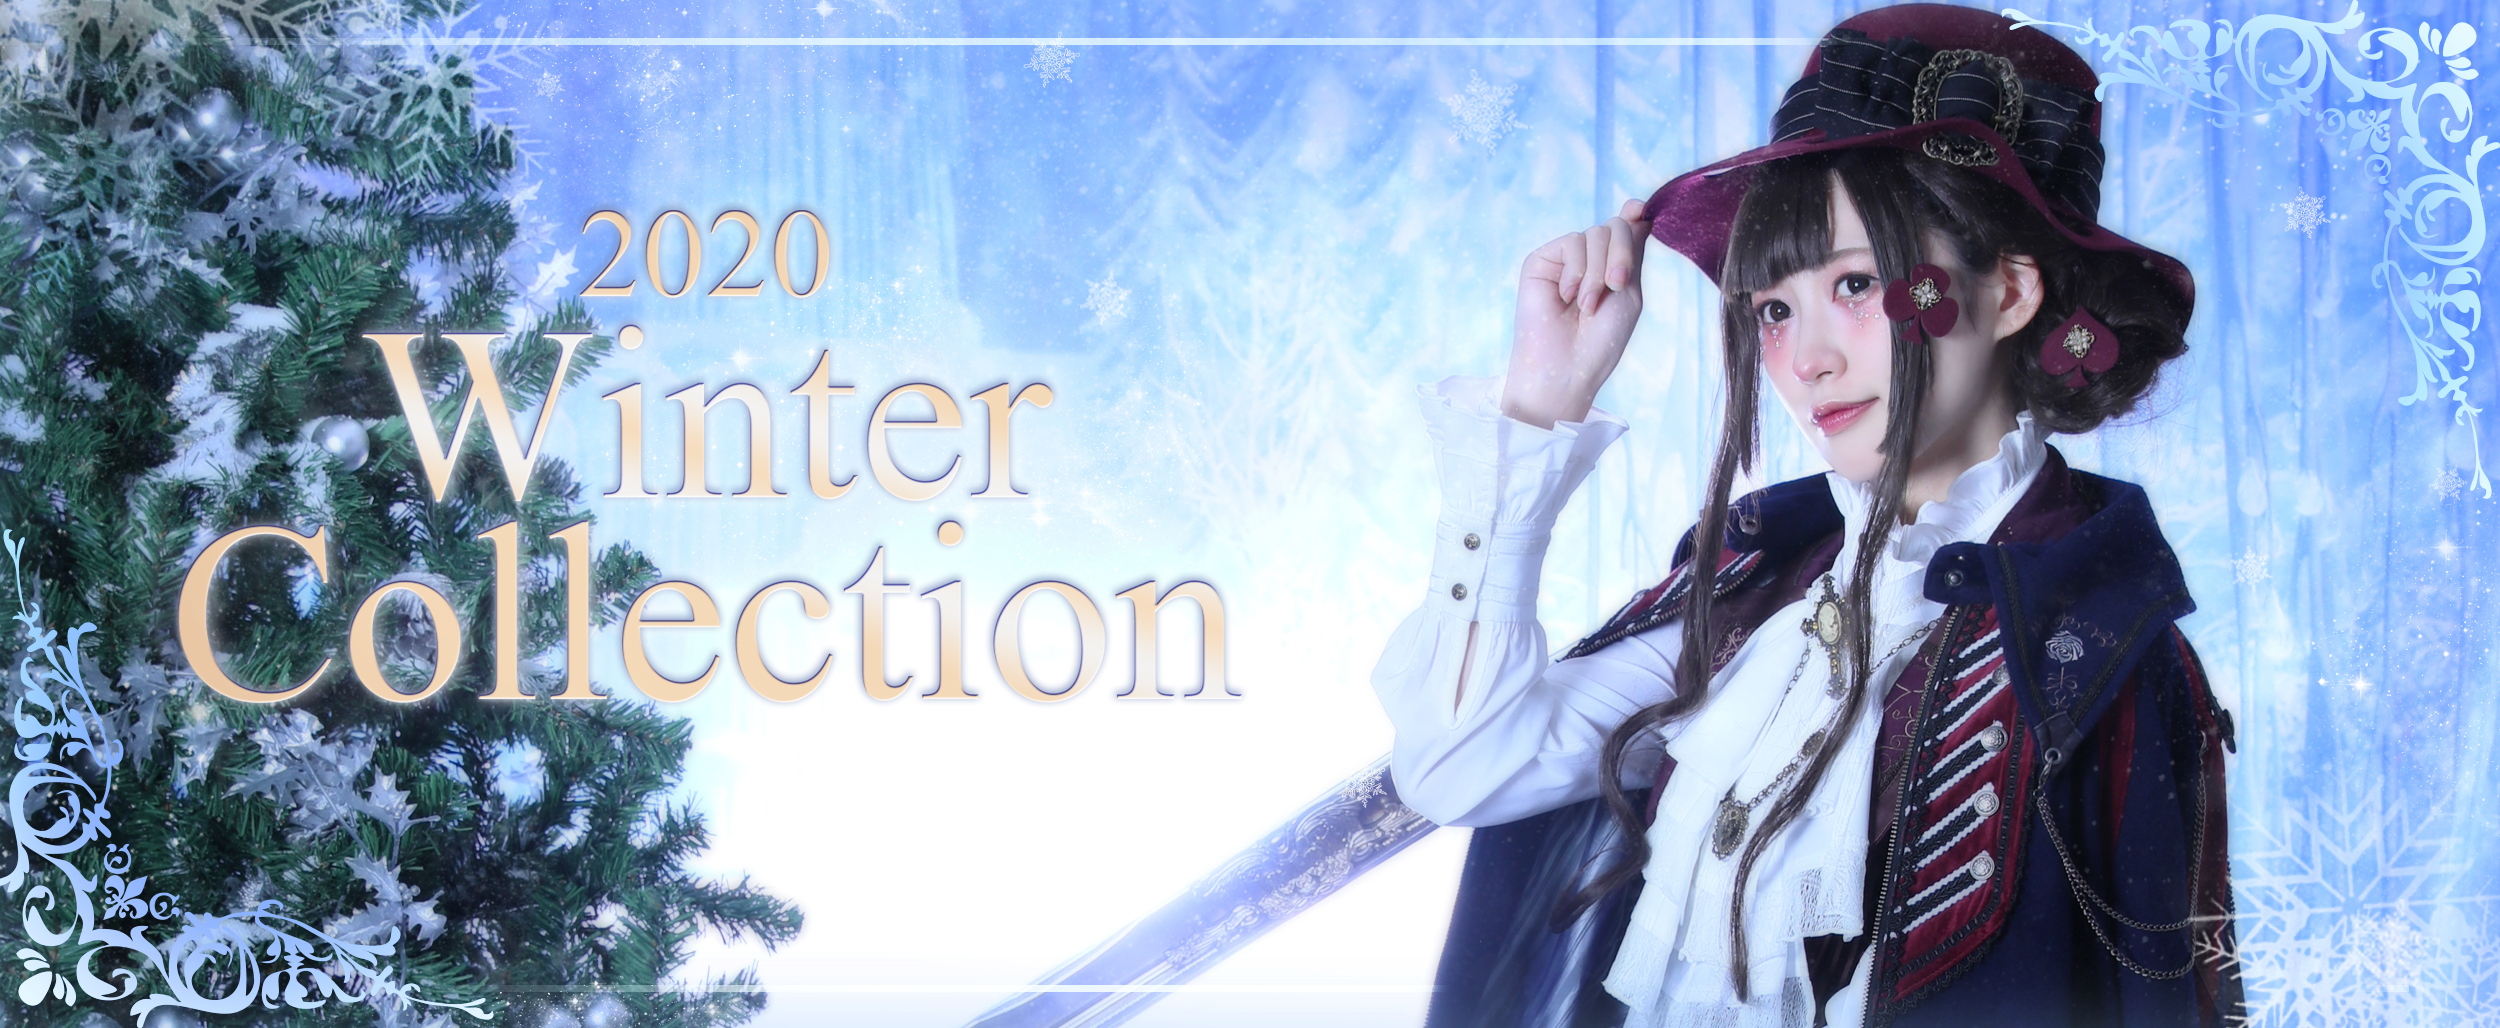 2020 WinterCollection